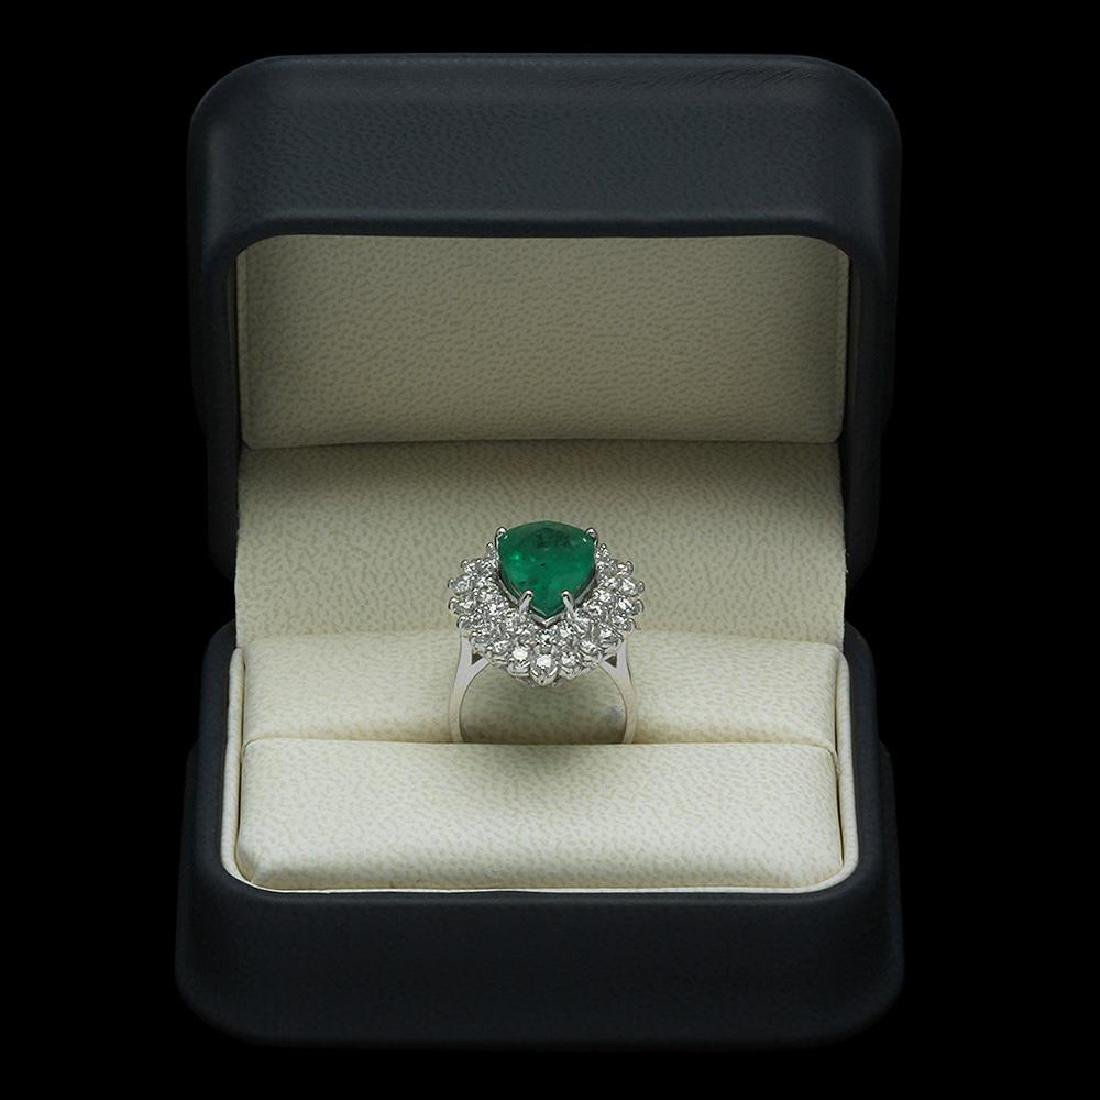 14K Gold 5.12ct Emerald & 2.75ct Diamond Ring - 4